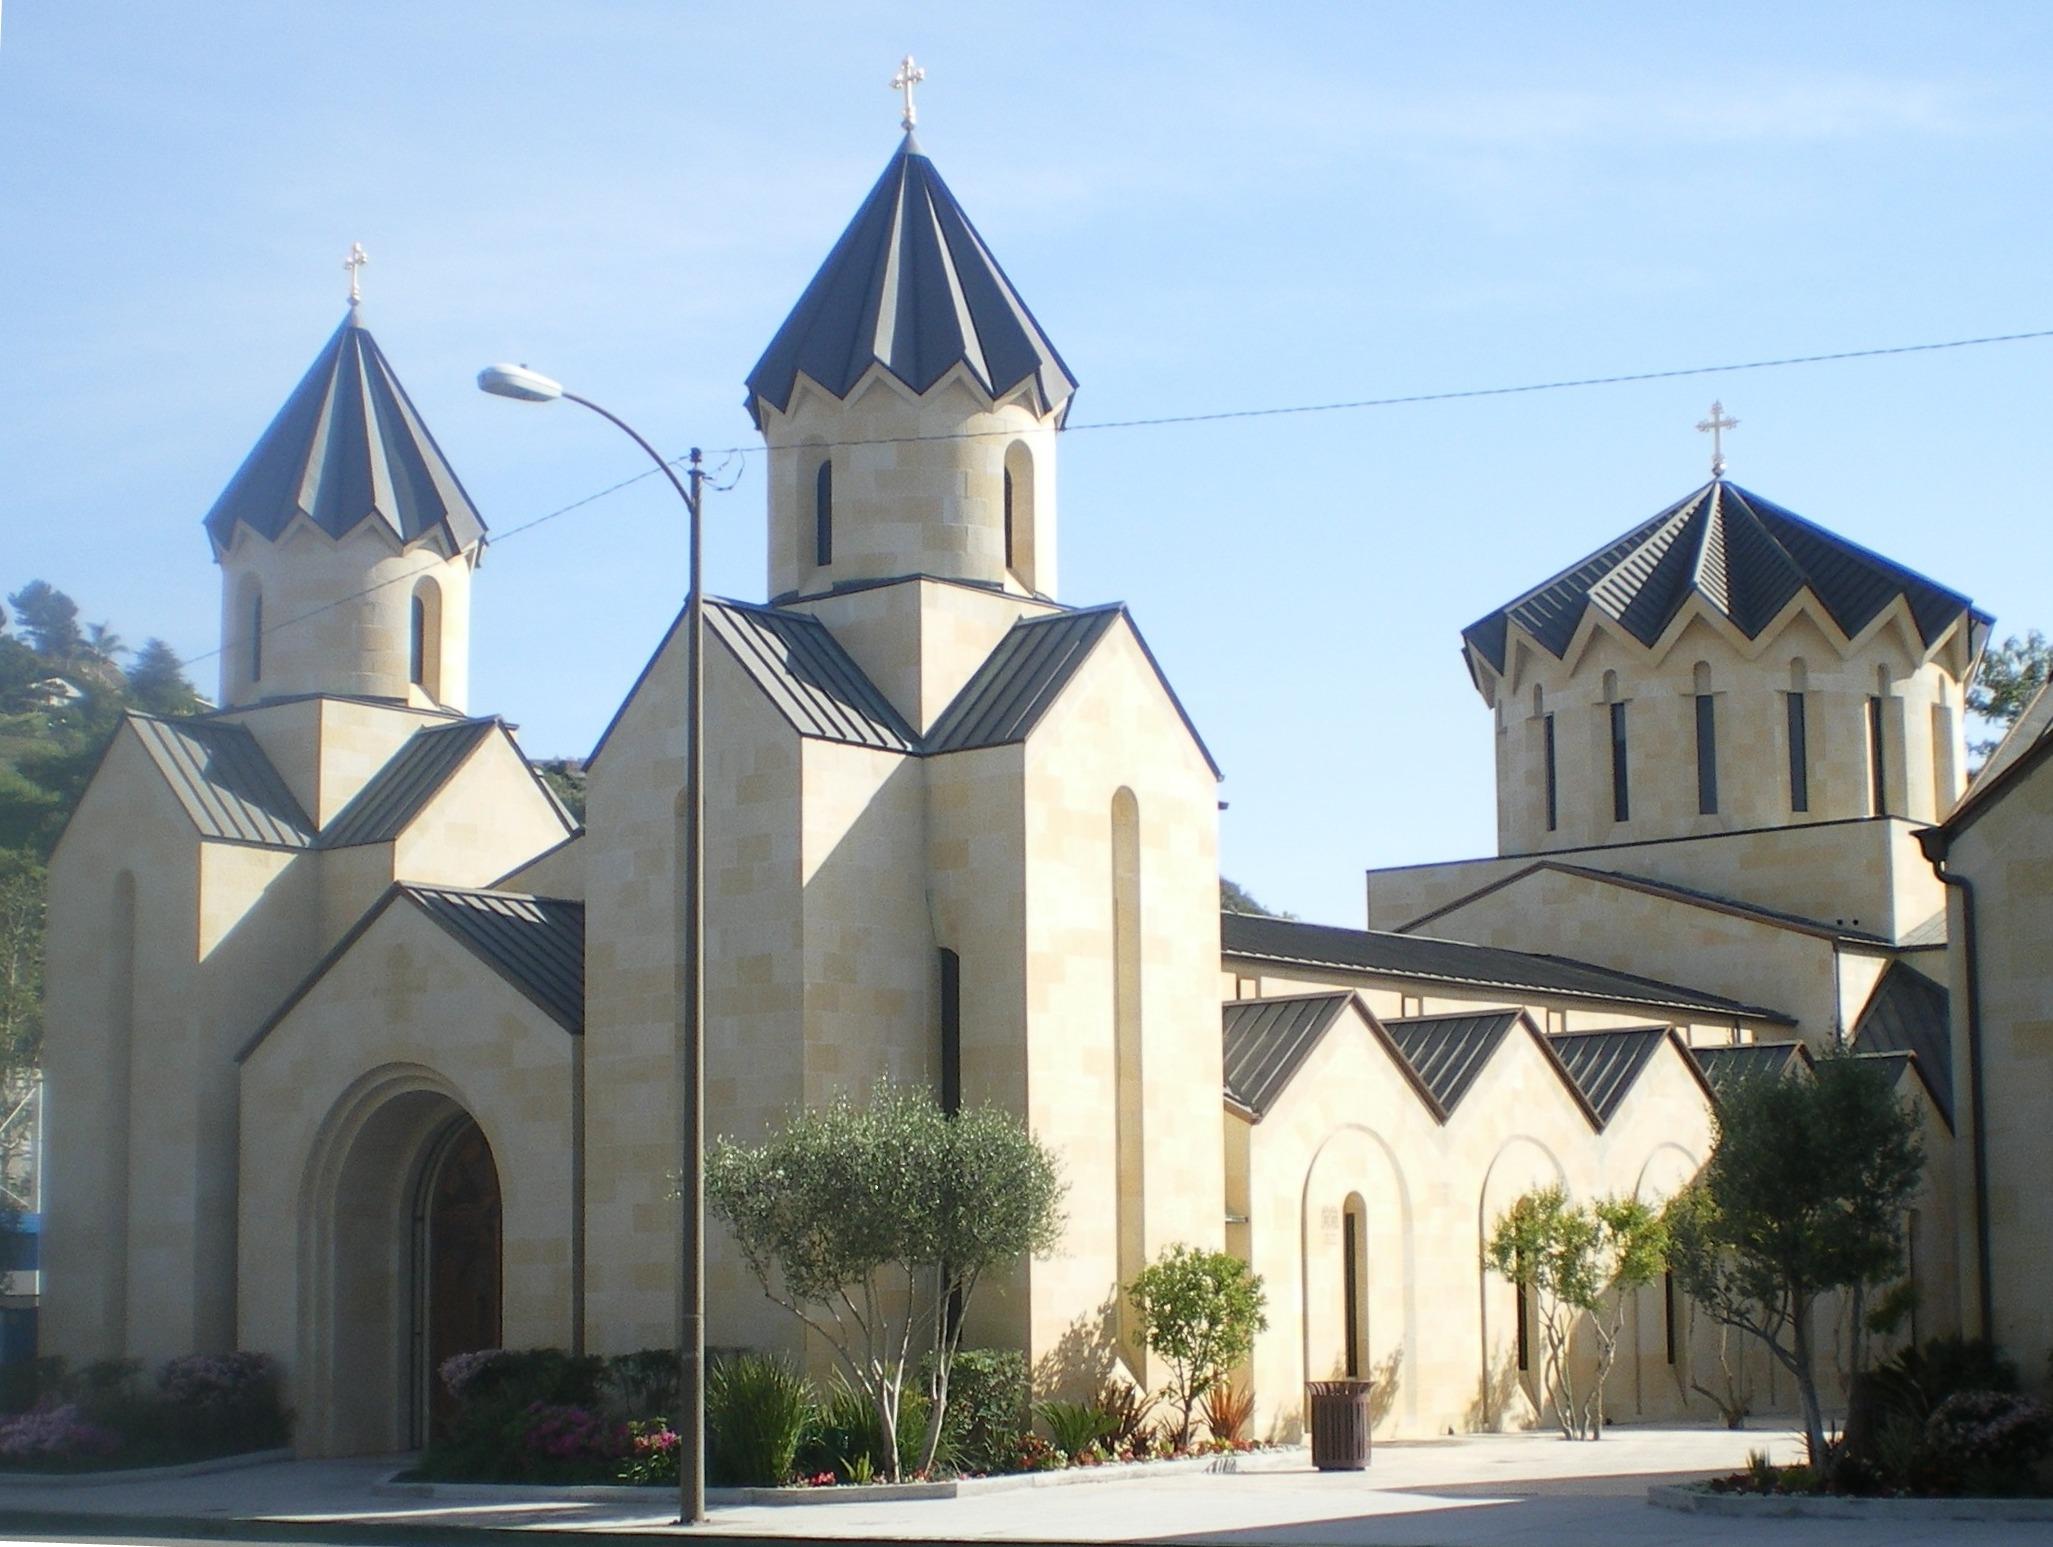 https://upload.wikimedia.org/wikipedia/commons/8/83/St._Gregory_Armenian_Catholic_Church%2C_Glendale%2C_California.JPG